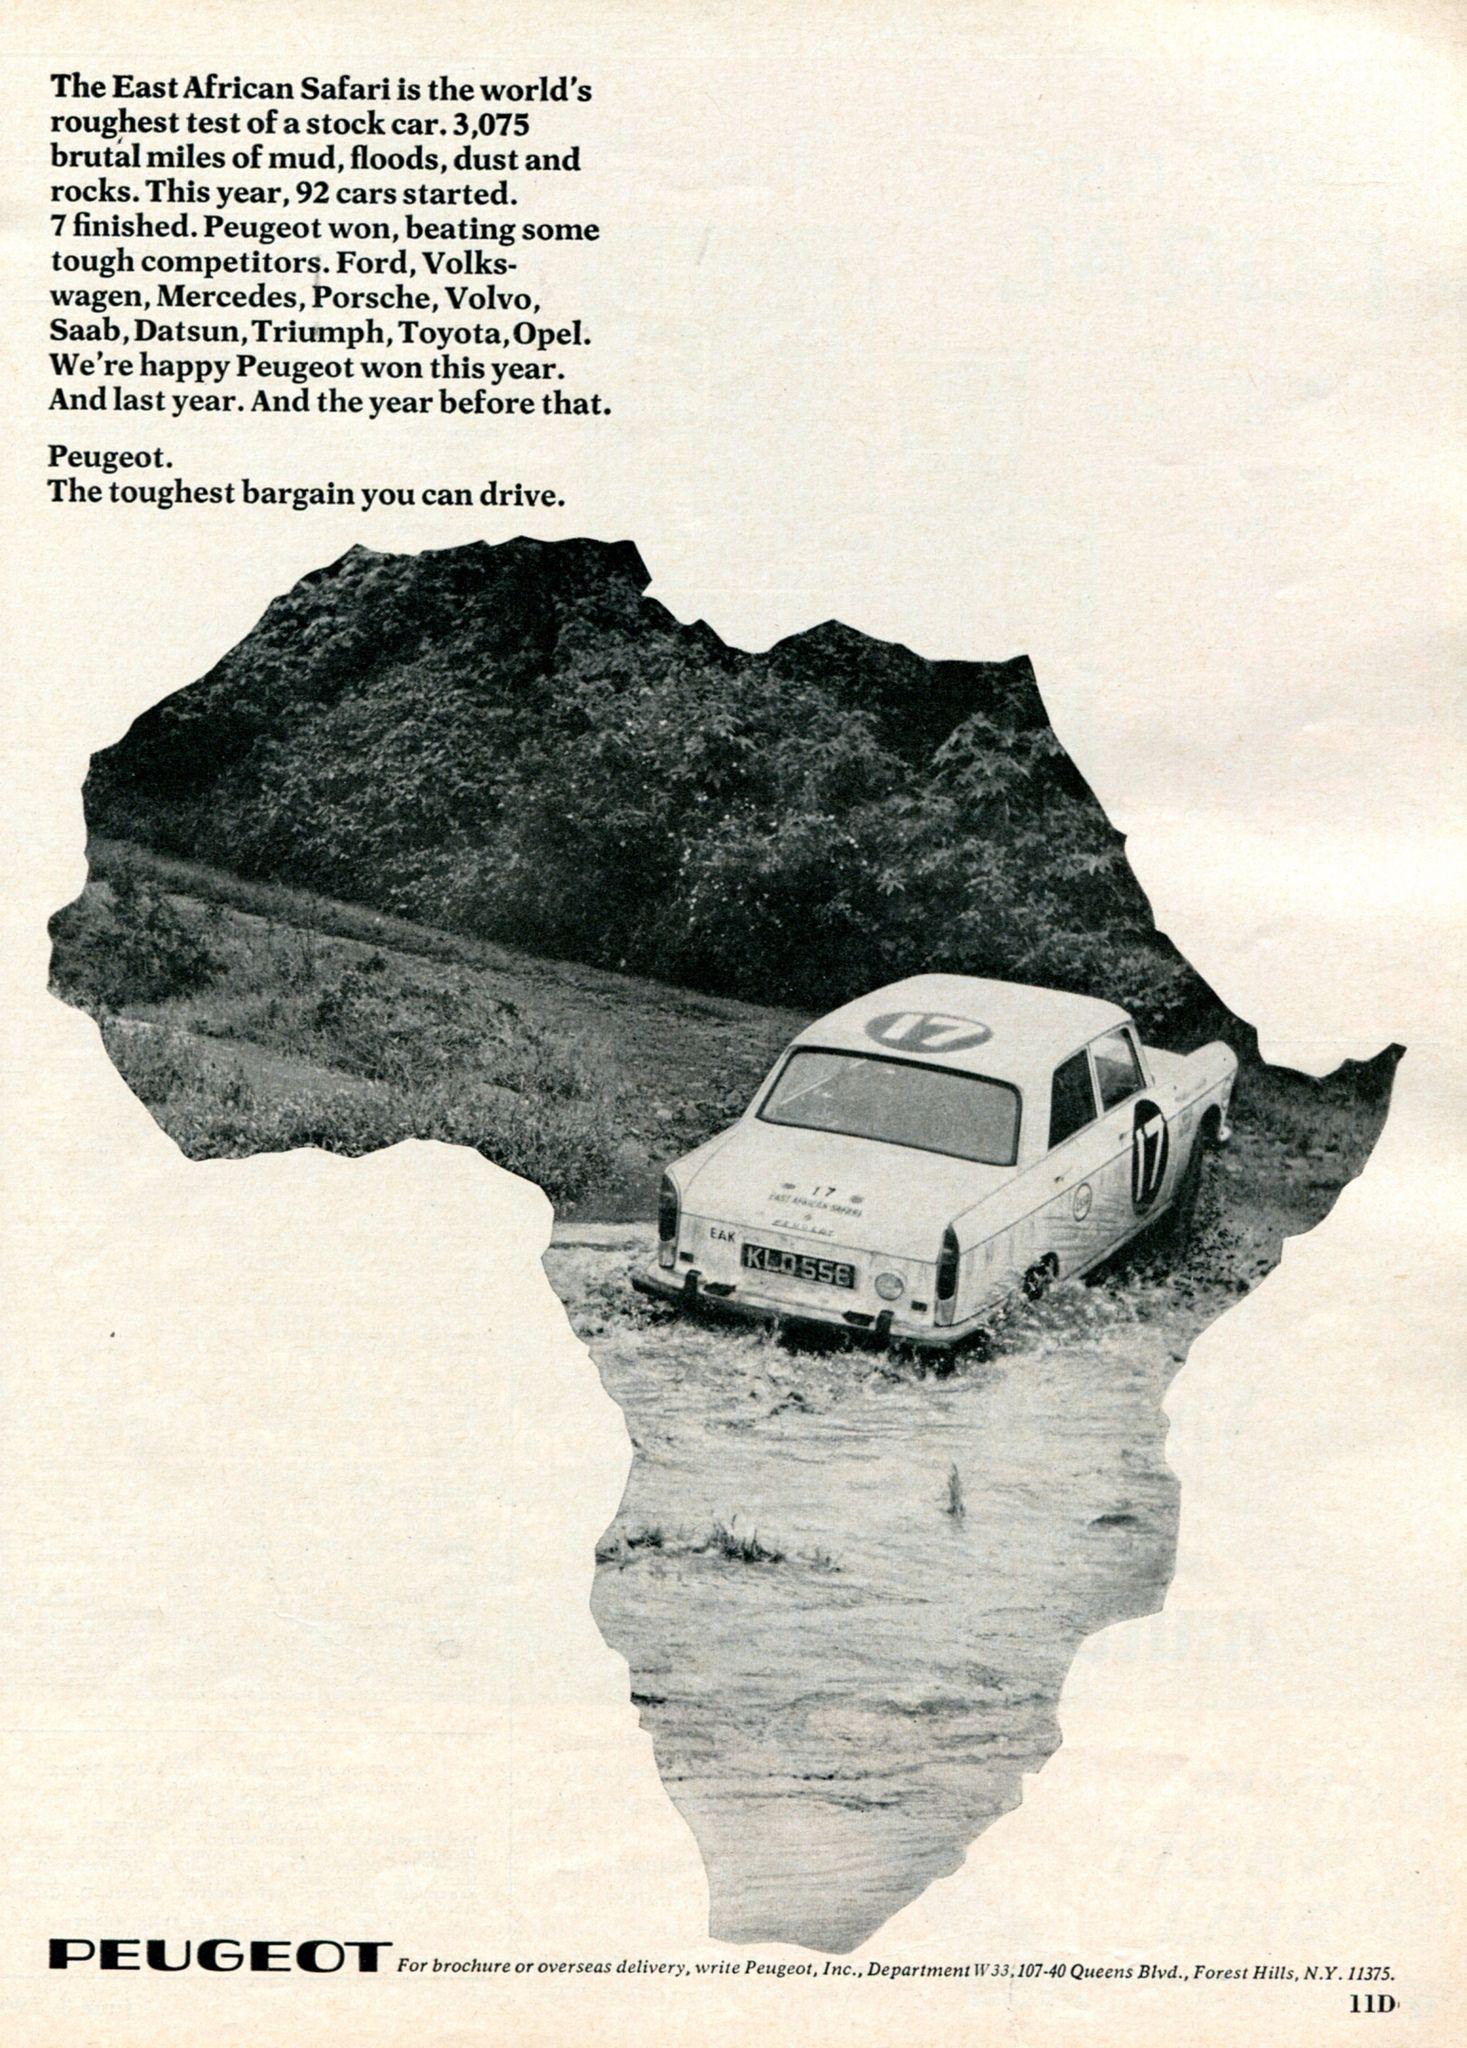 1968 Peugeot Advertisement Newsweek June 3 1968 Peugeot